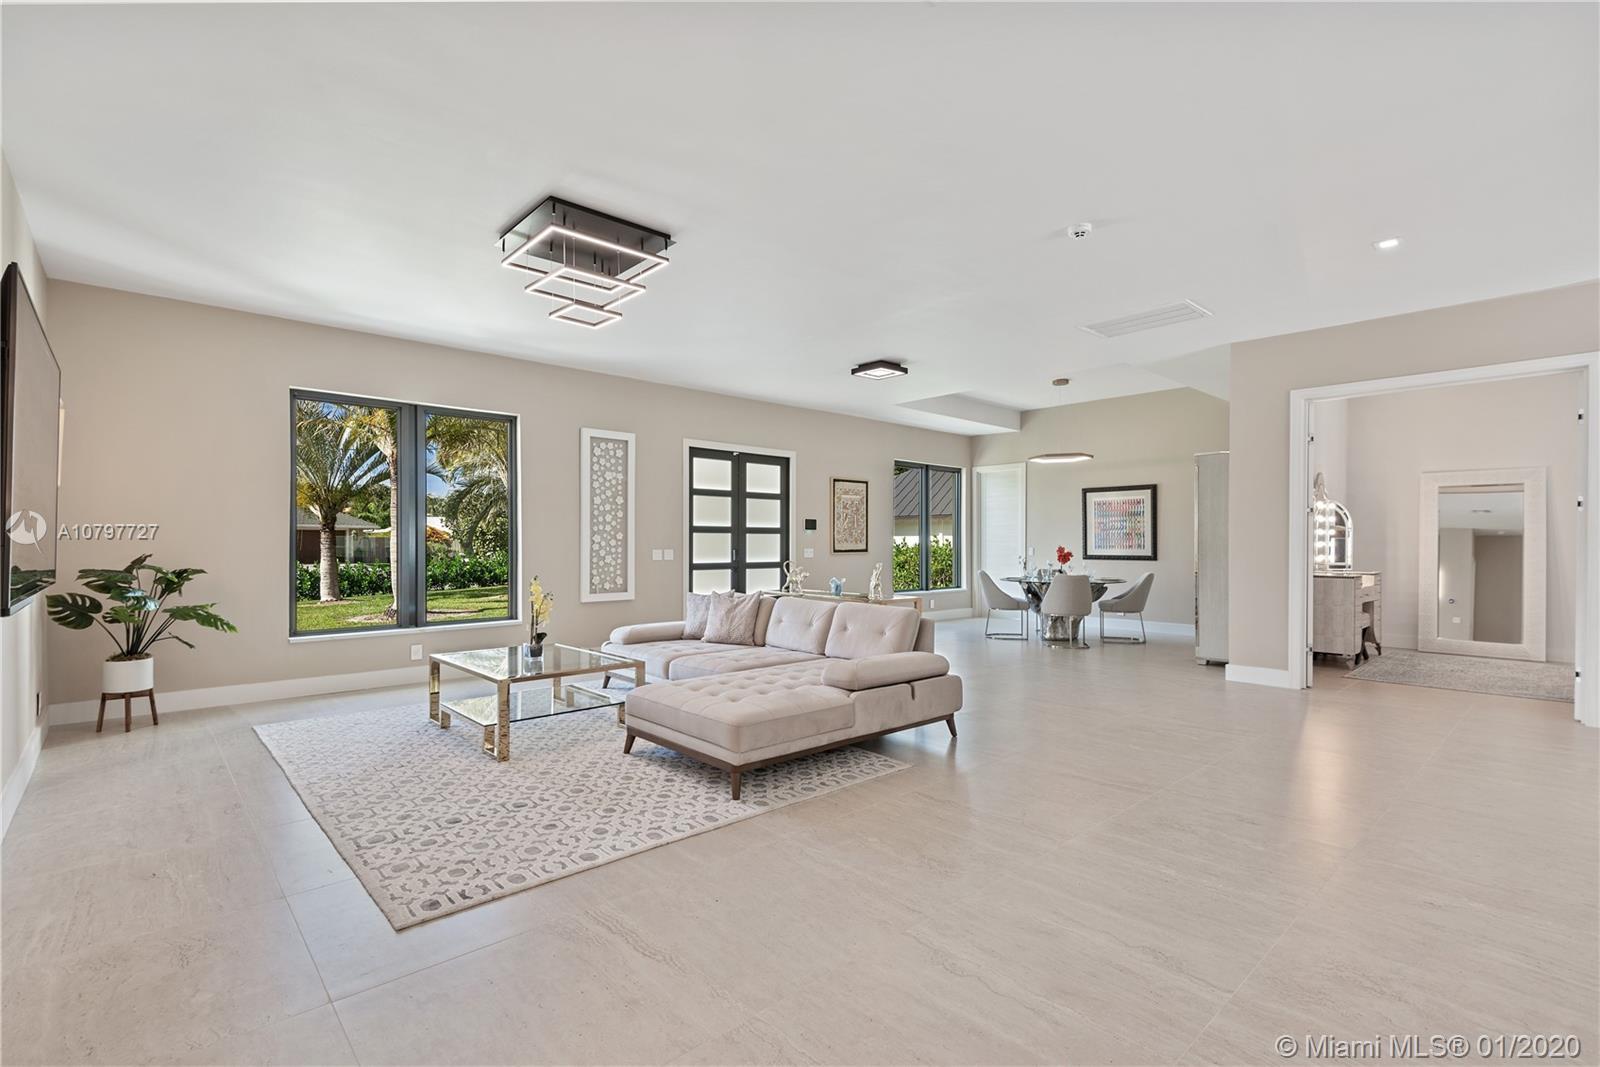 14036 N Miller Dr - West Palm Beach, Florida